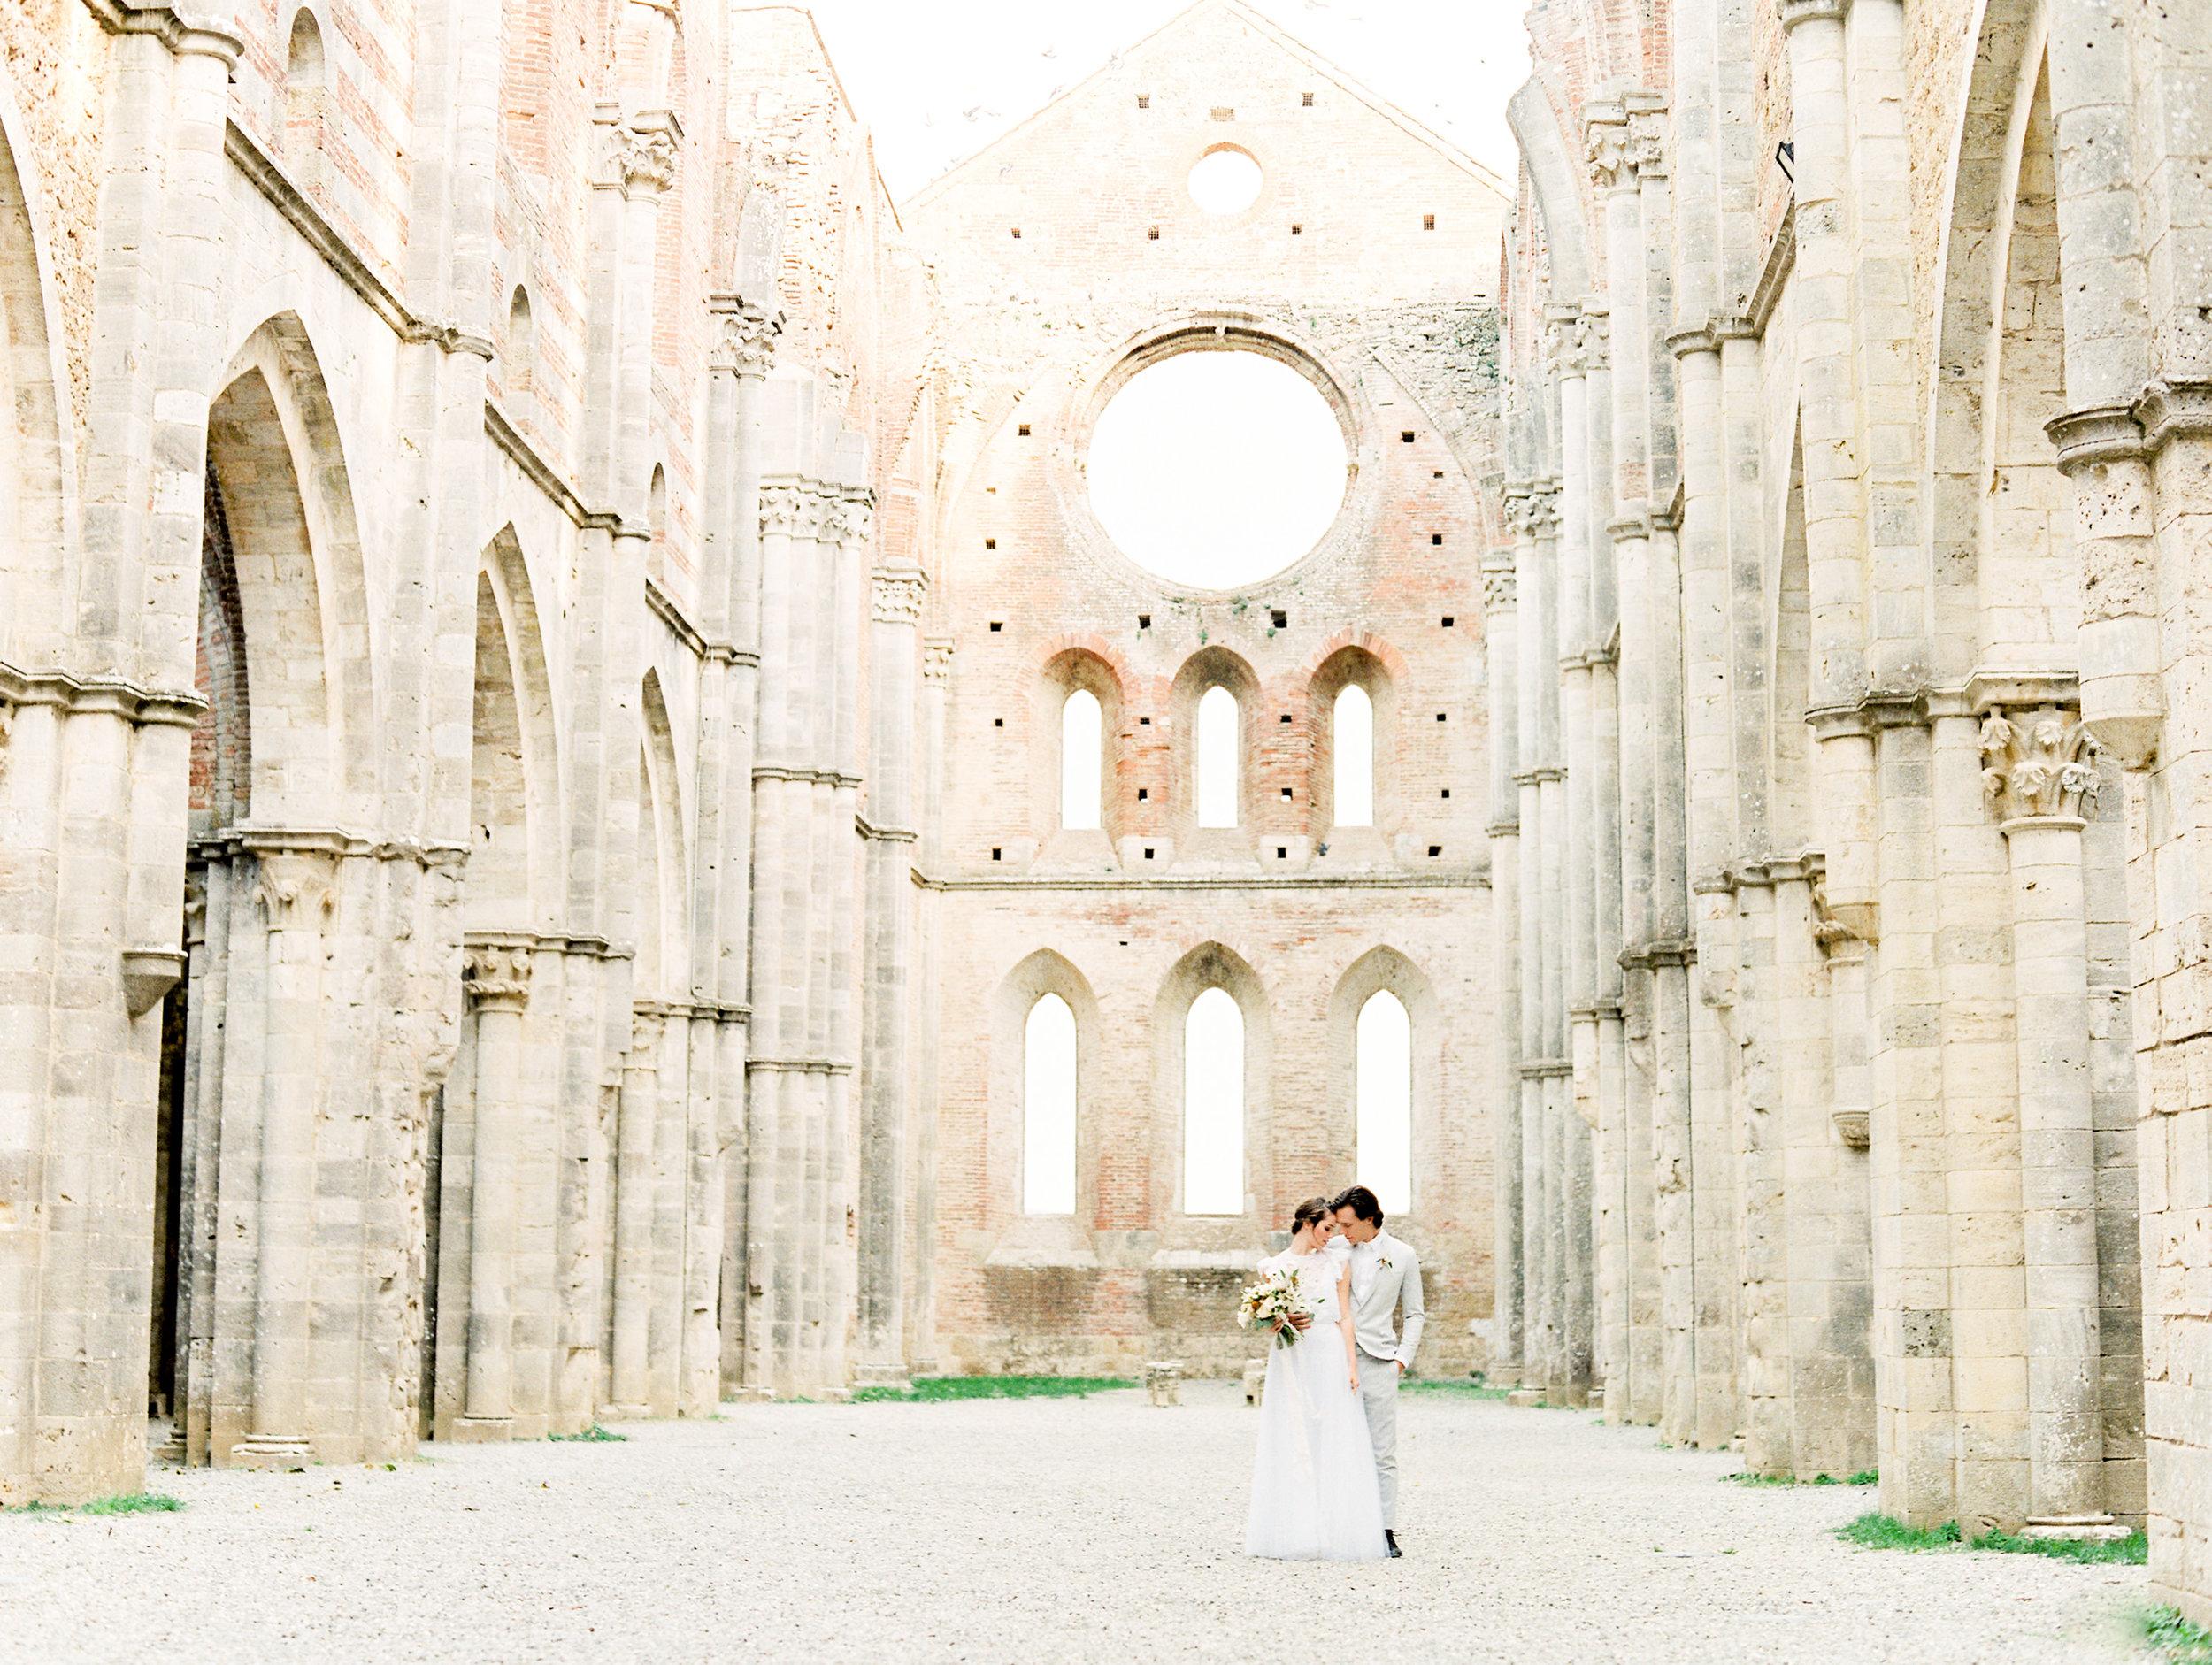 romantic-italy-wedding-in-tuscany-114.jpg